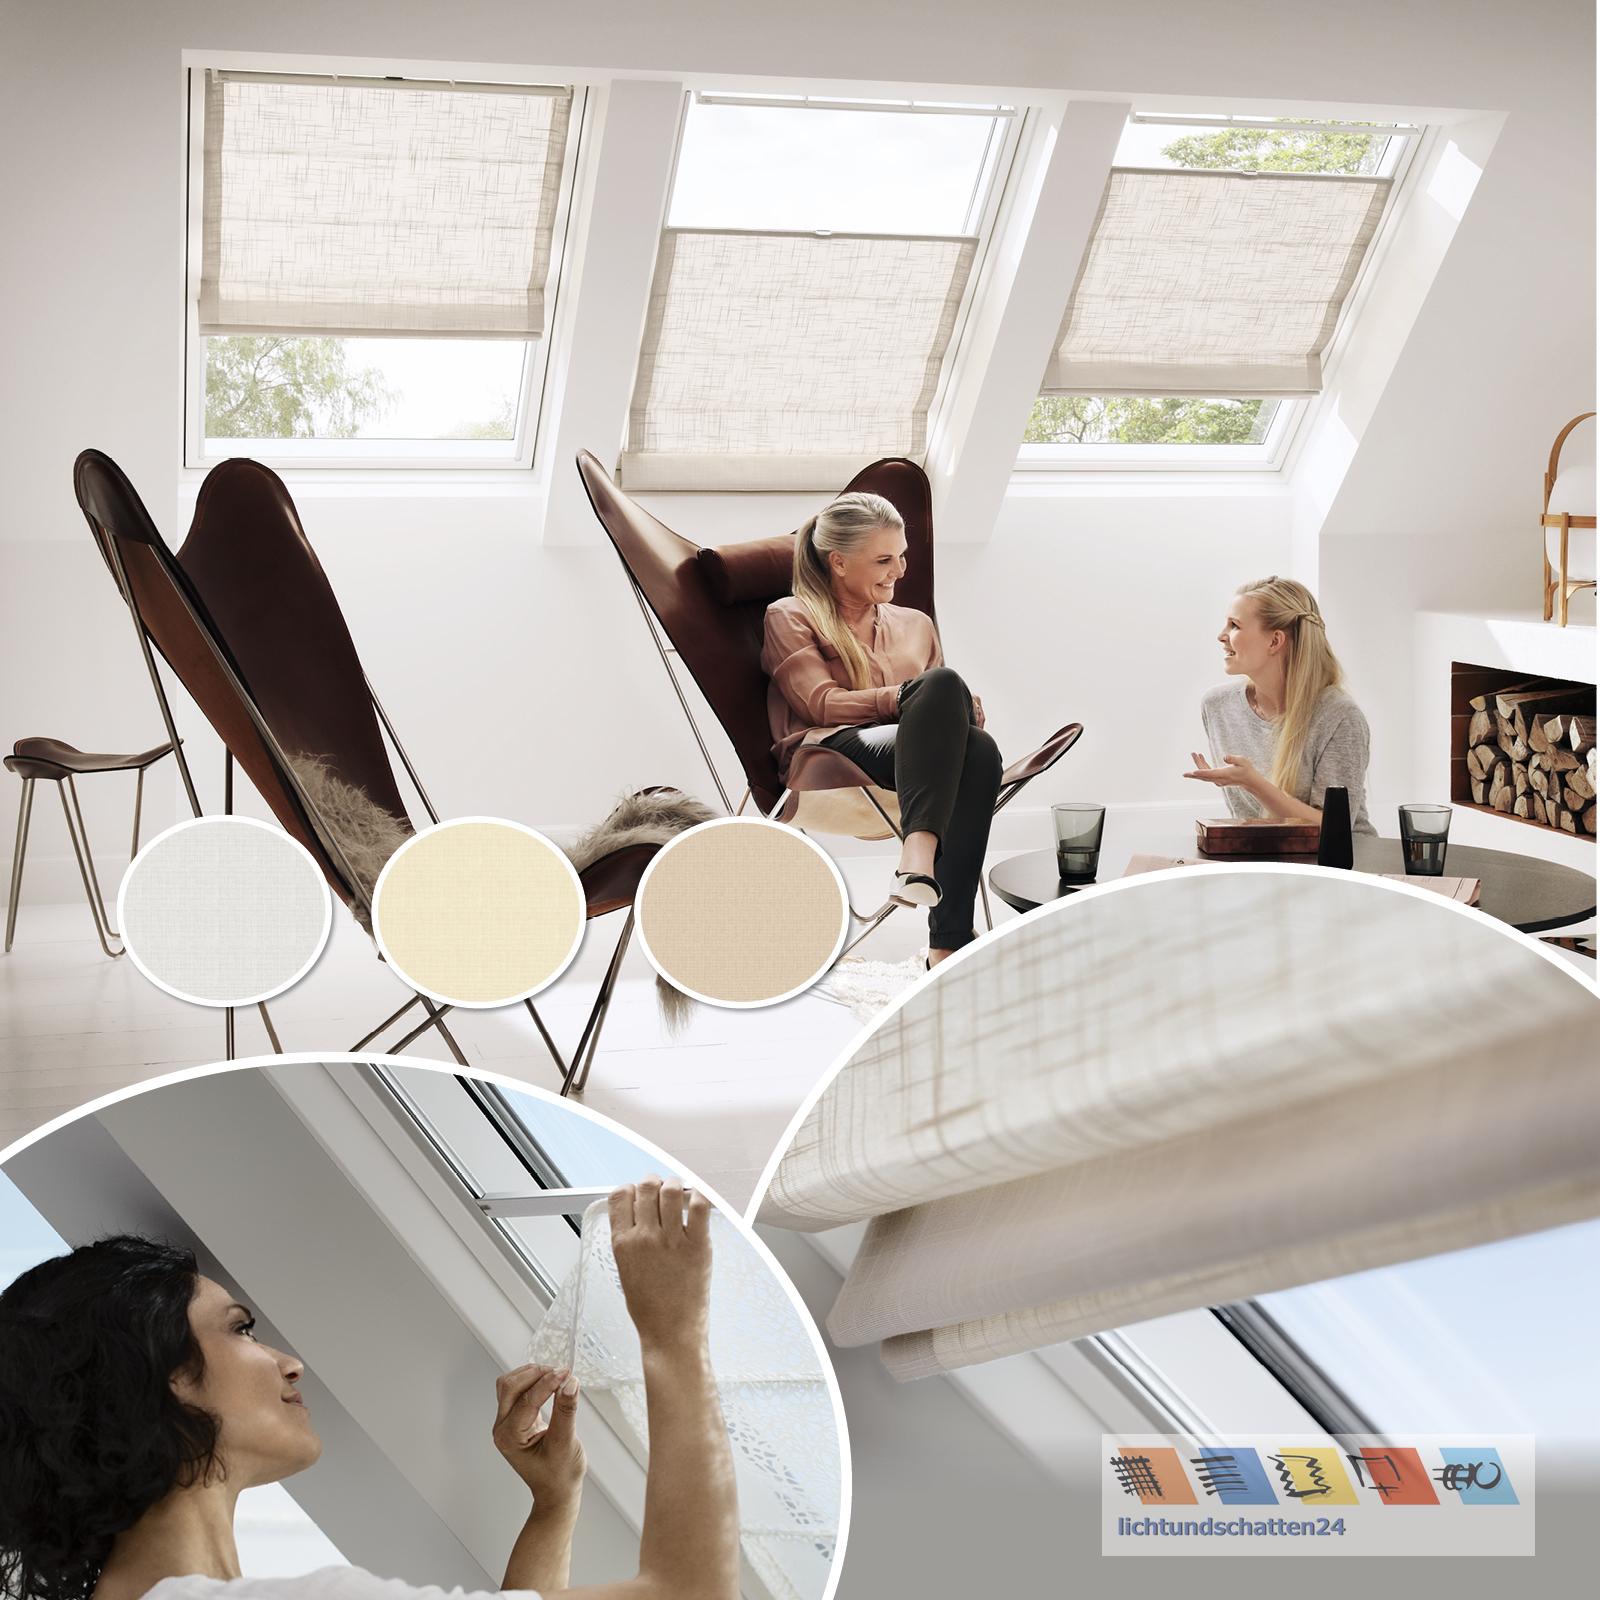 original velux raff rollos fhb f r ggl gpl ghl gtl ggu gpu ghu fb 6500 6503 6513 ebay. Black Bedroom Furniture Sets. Home Design Ideas